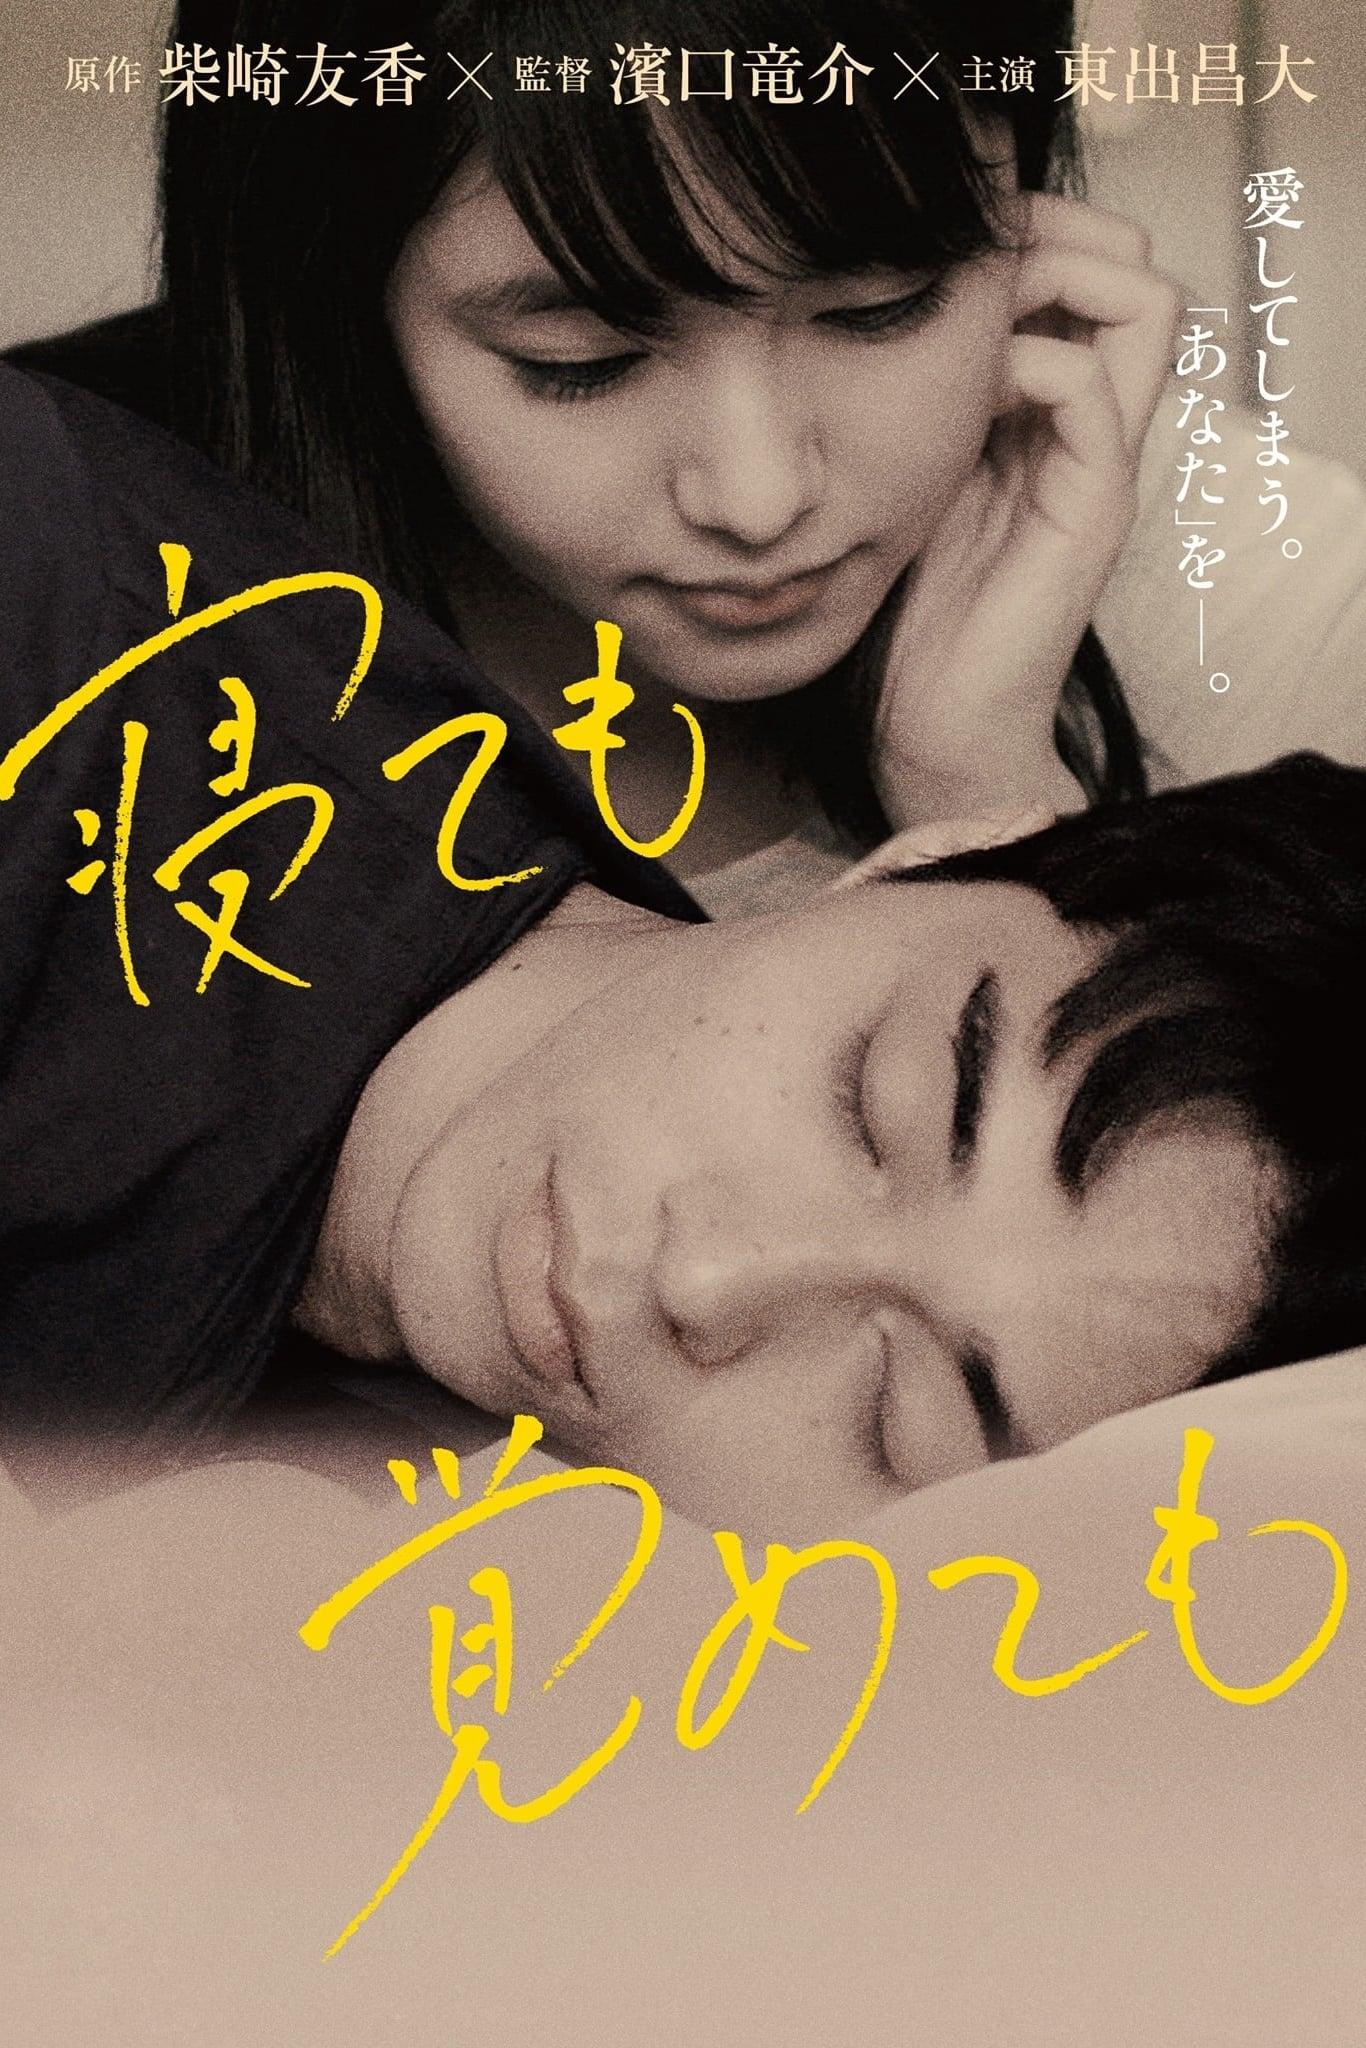 image for Asako I & II